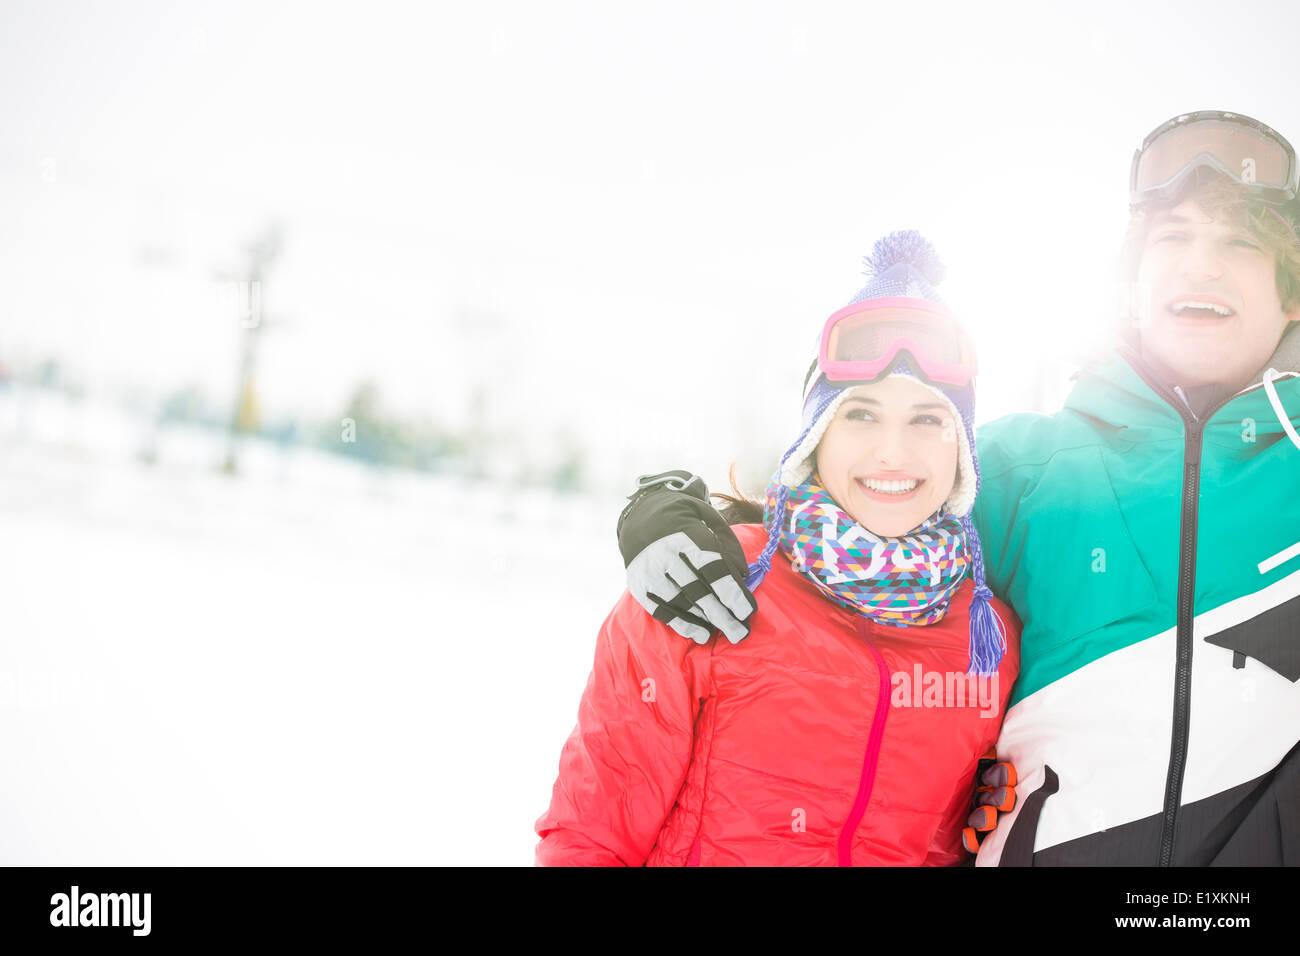 Pareja joven alegre de pie brazo alrededor en la nieve Imagen De Stock